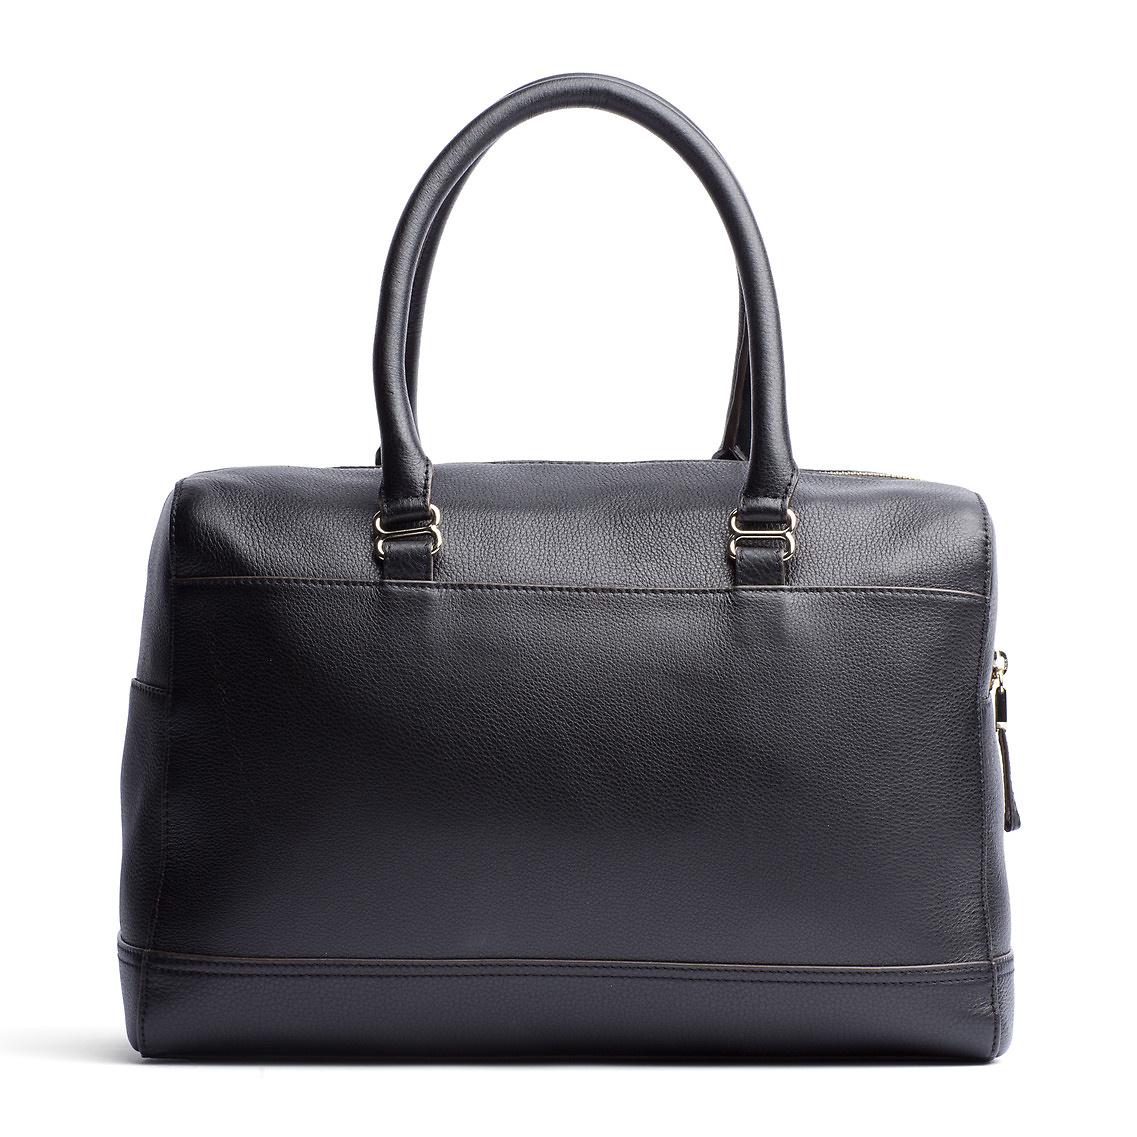 f4e9d2594d Tommy Hilfiger Ellery Duffle Bag in Black - Lyst